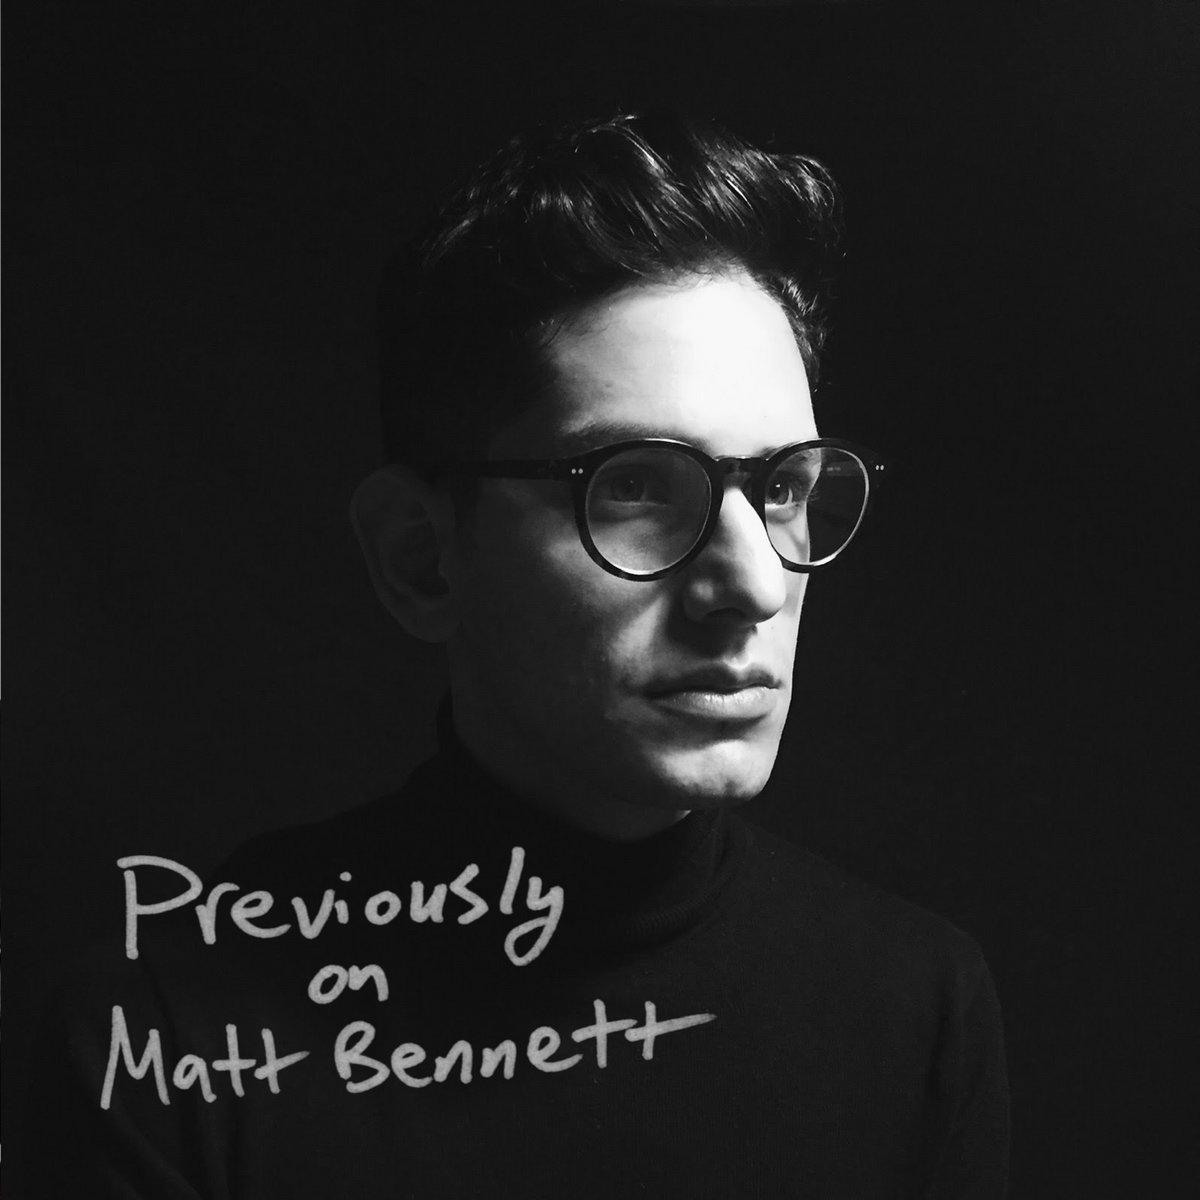 Matt Bennett birthday